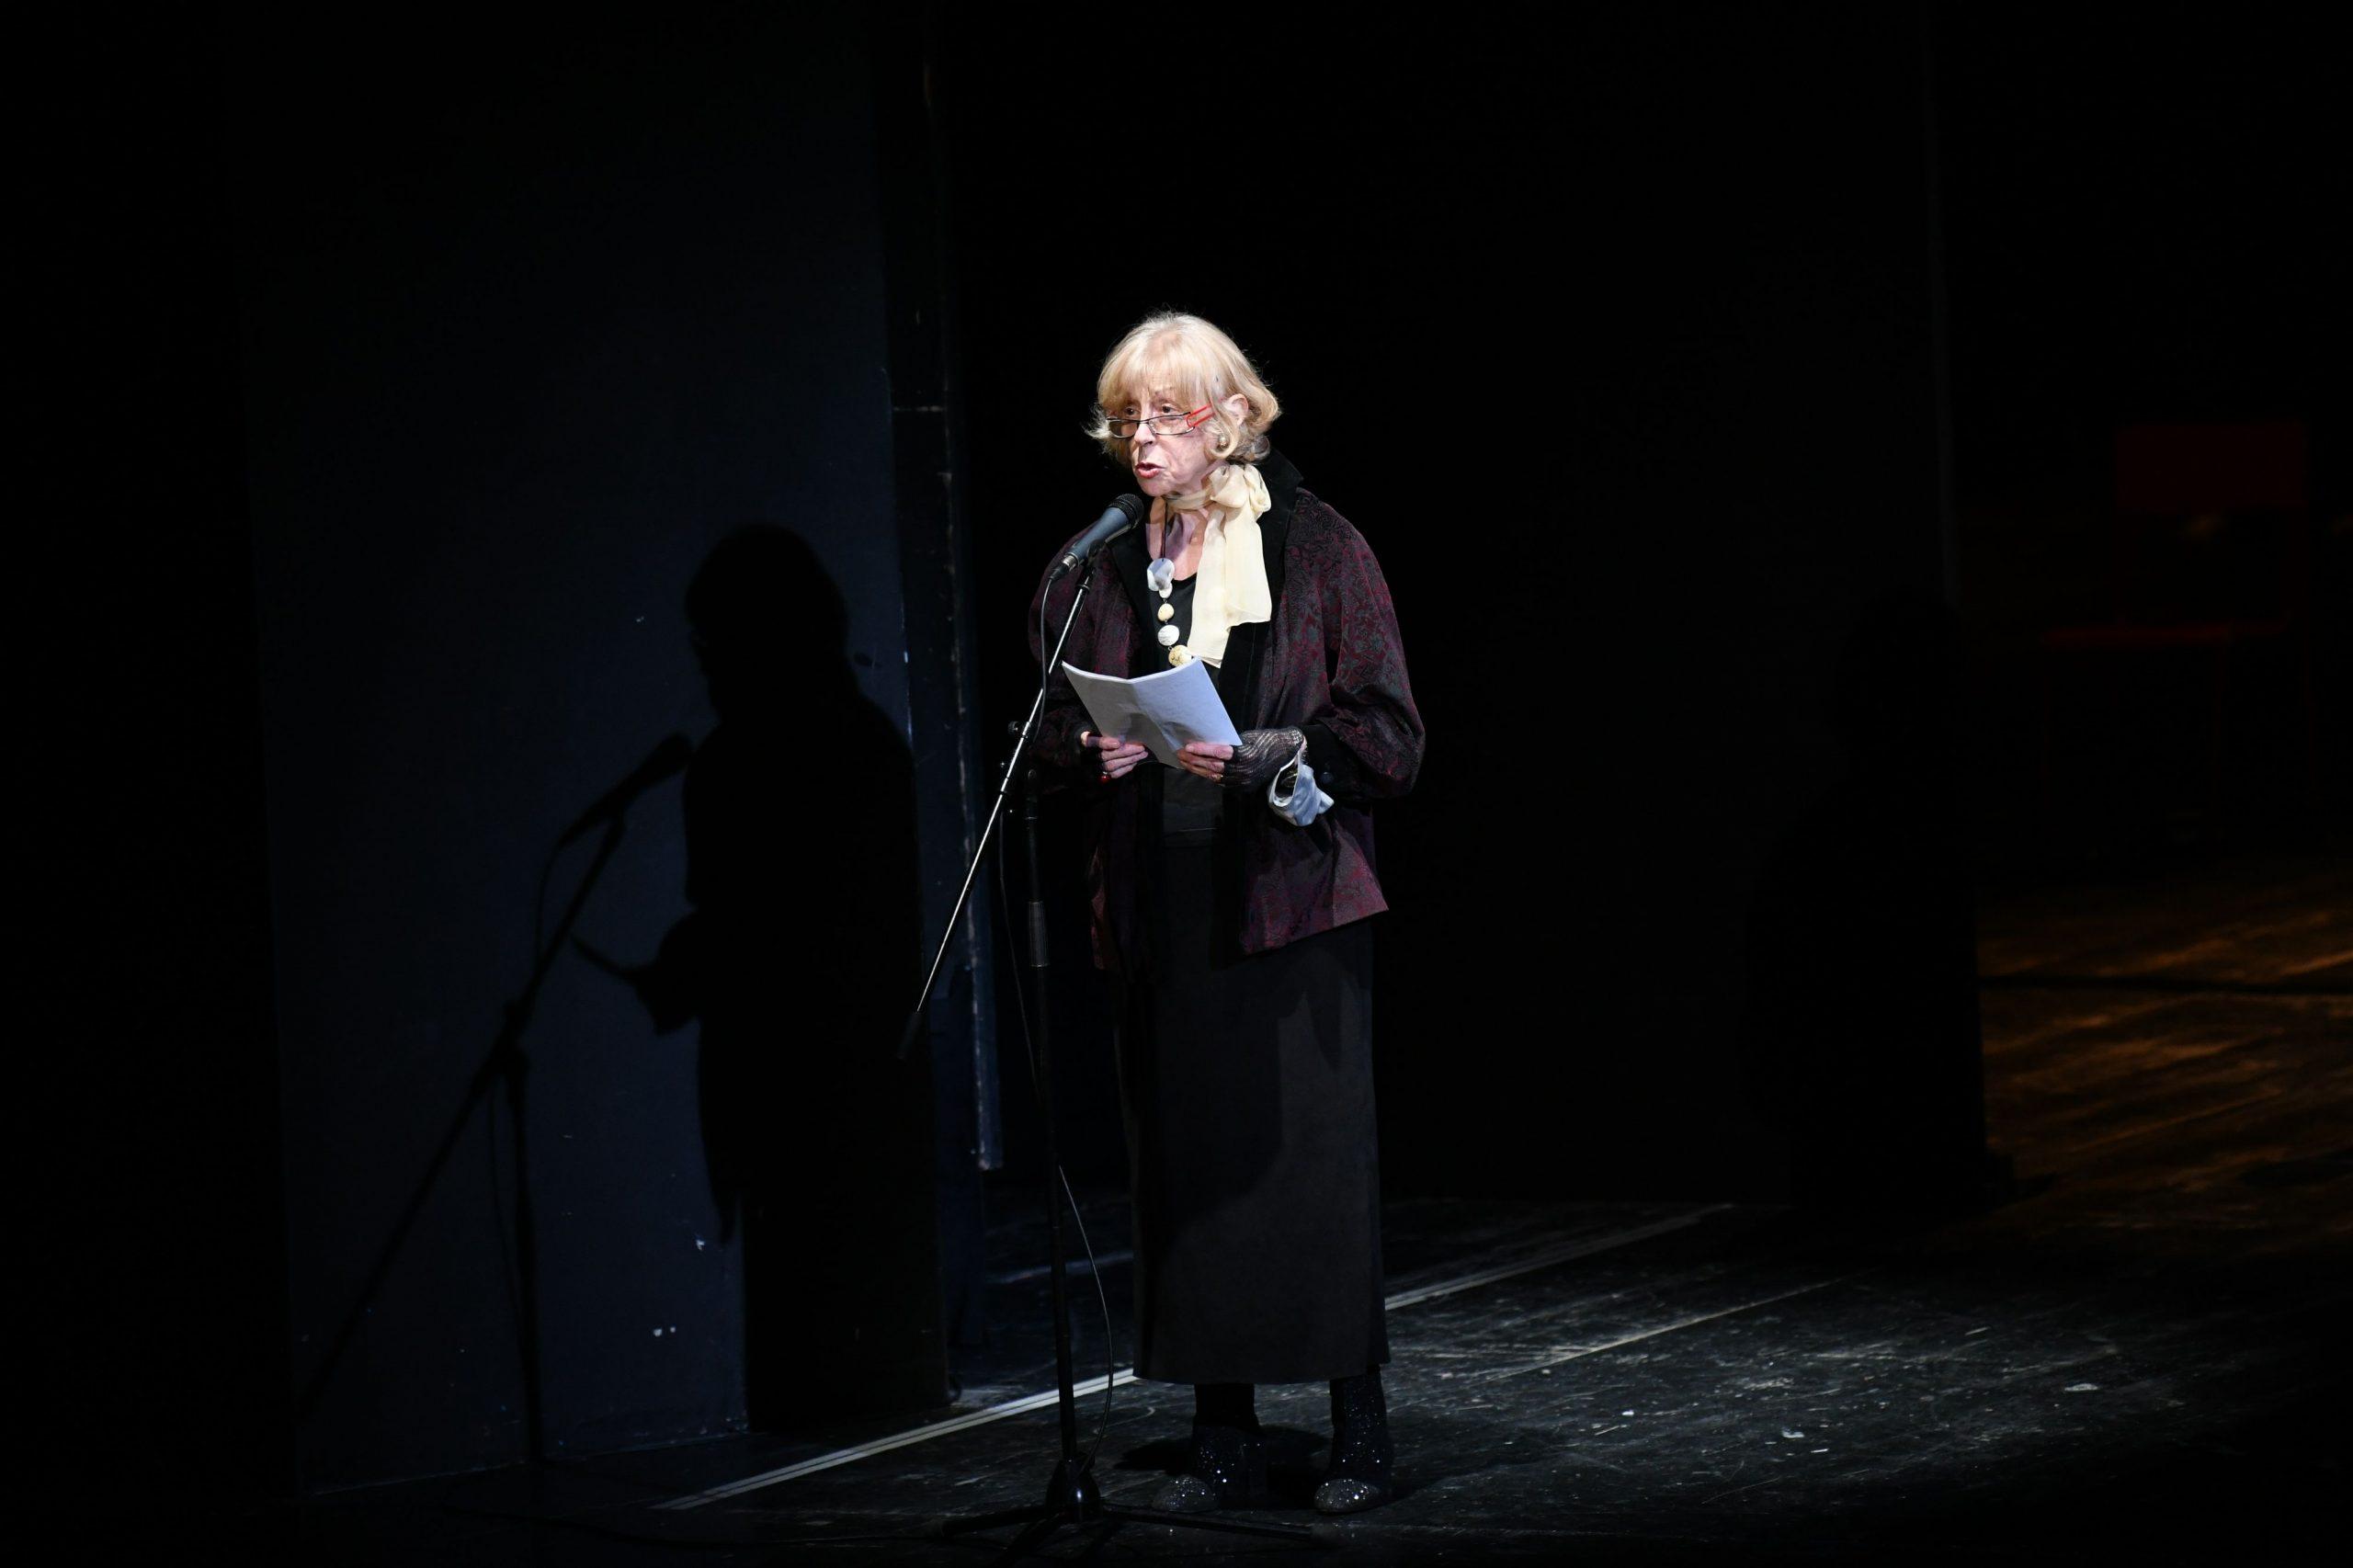 Komemoracija povodom smrti glumca Vlaste Velisavljevica